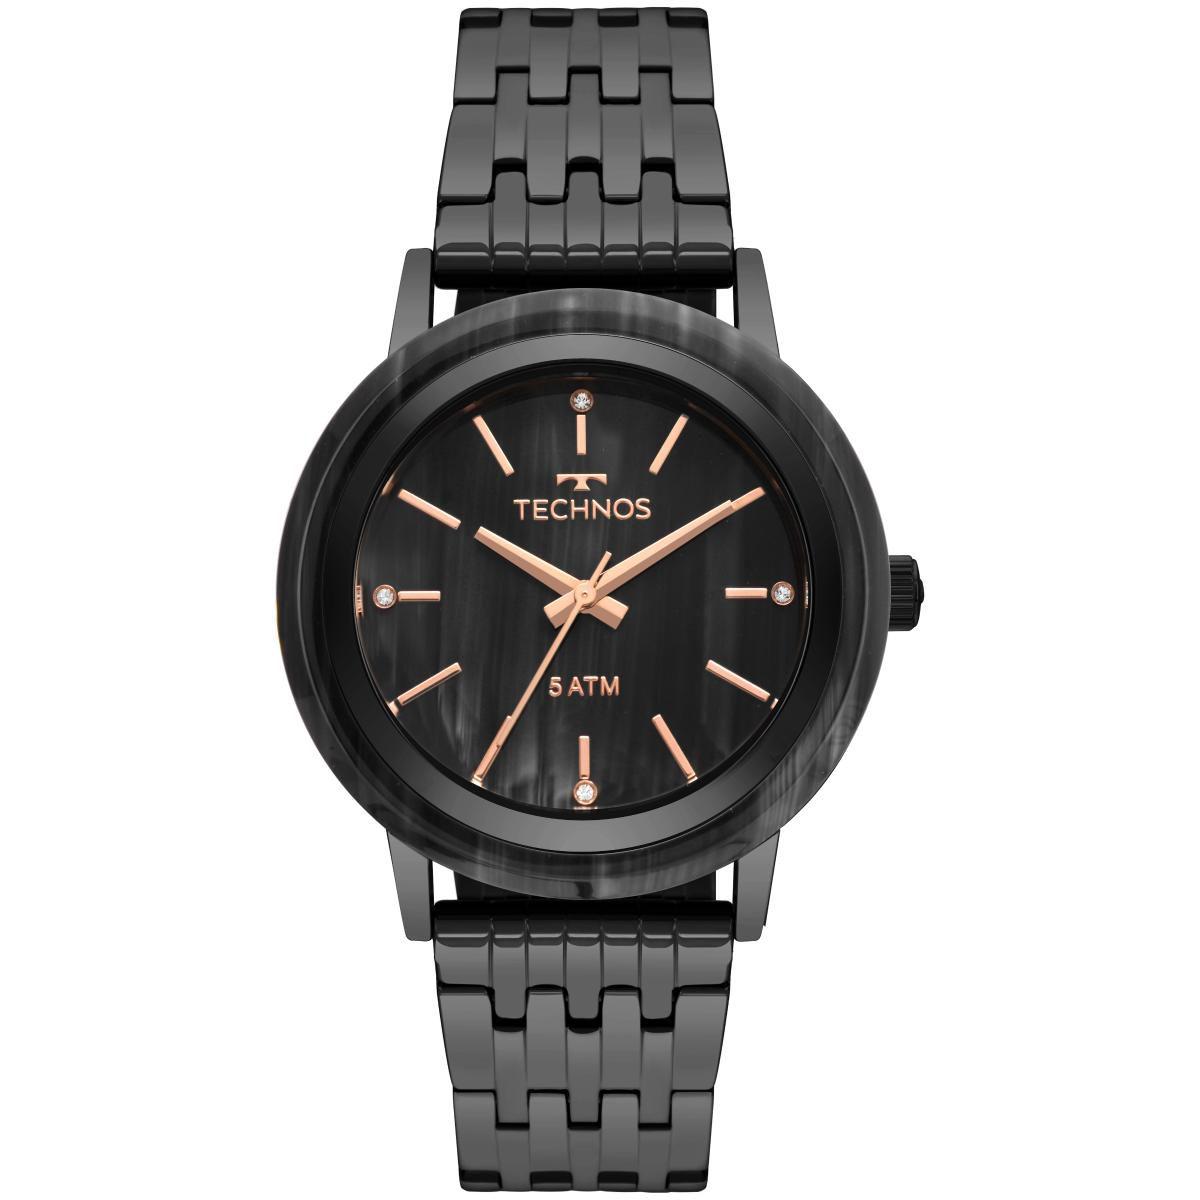 Relógio Feminino Technos Fashion Unique 203AAE/4P 40mm Aço Preto